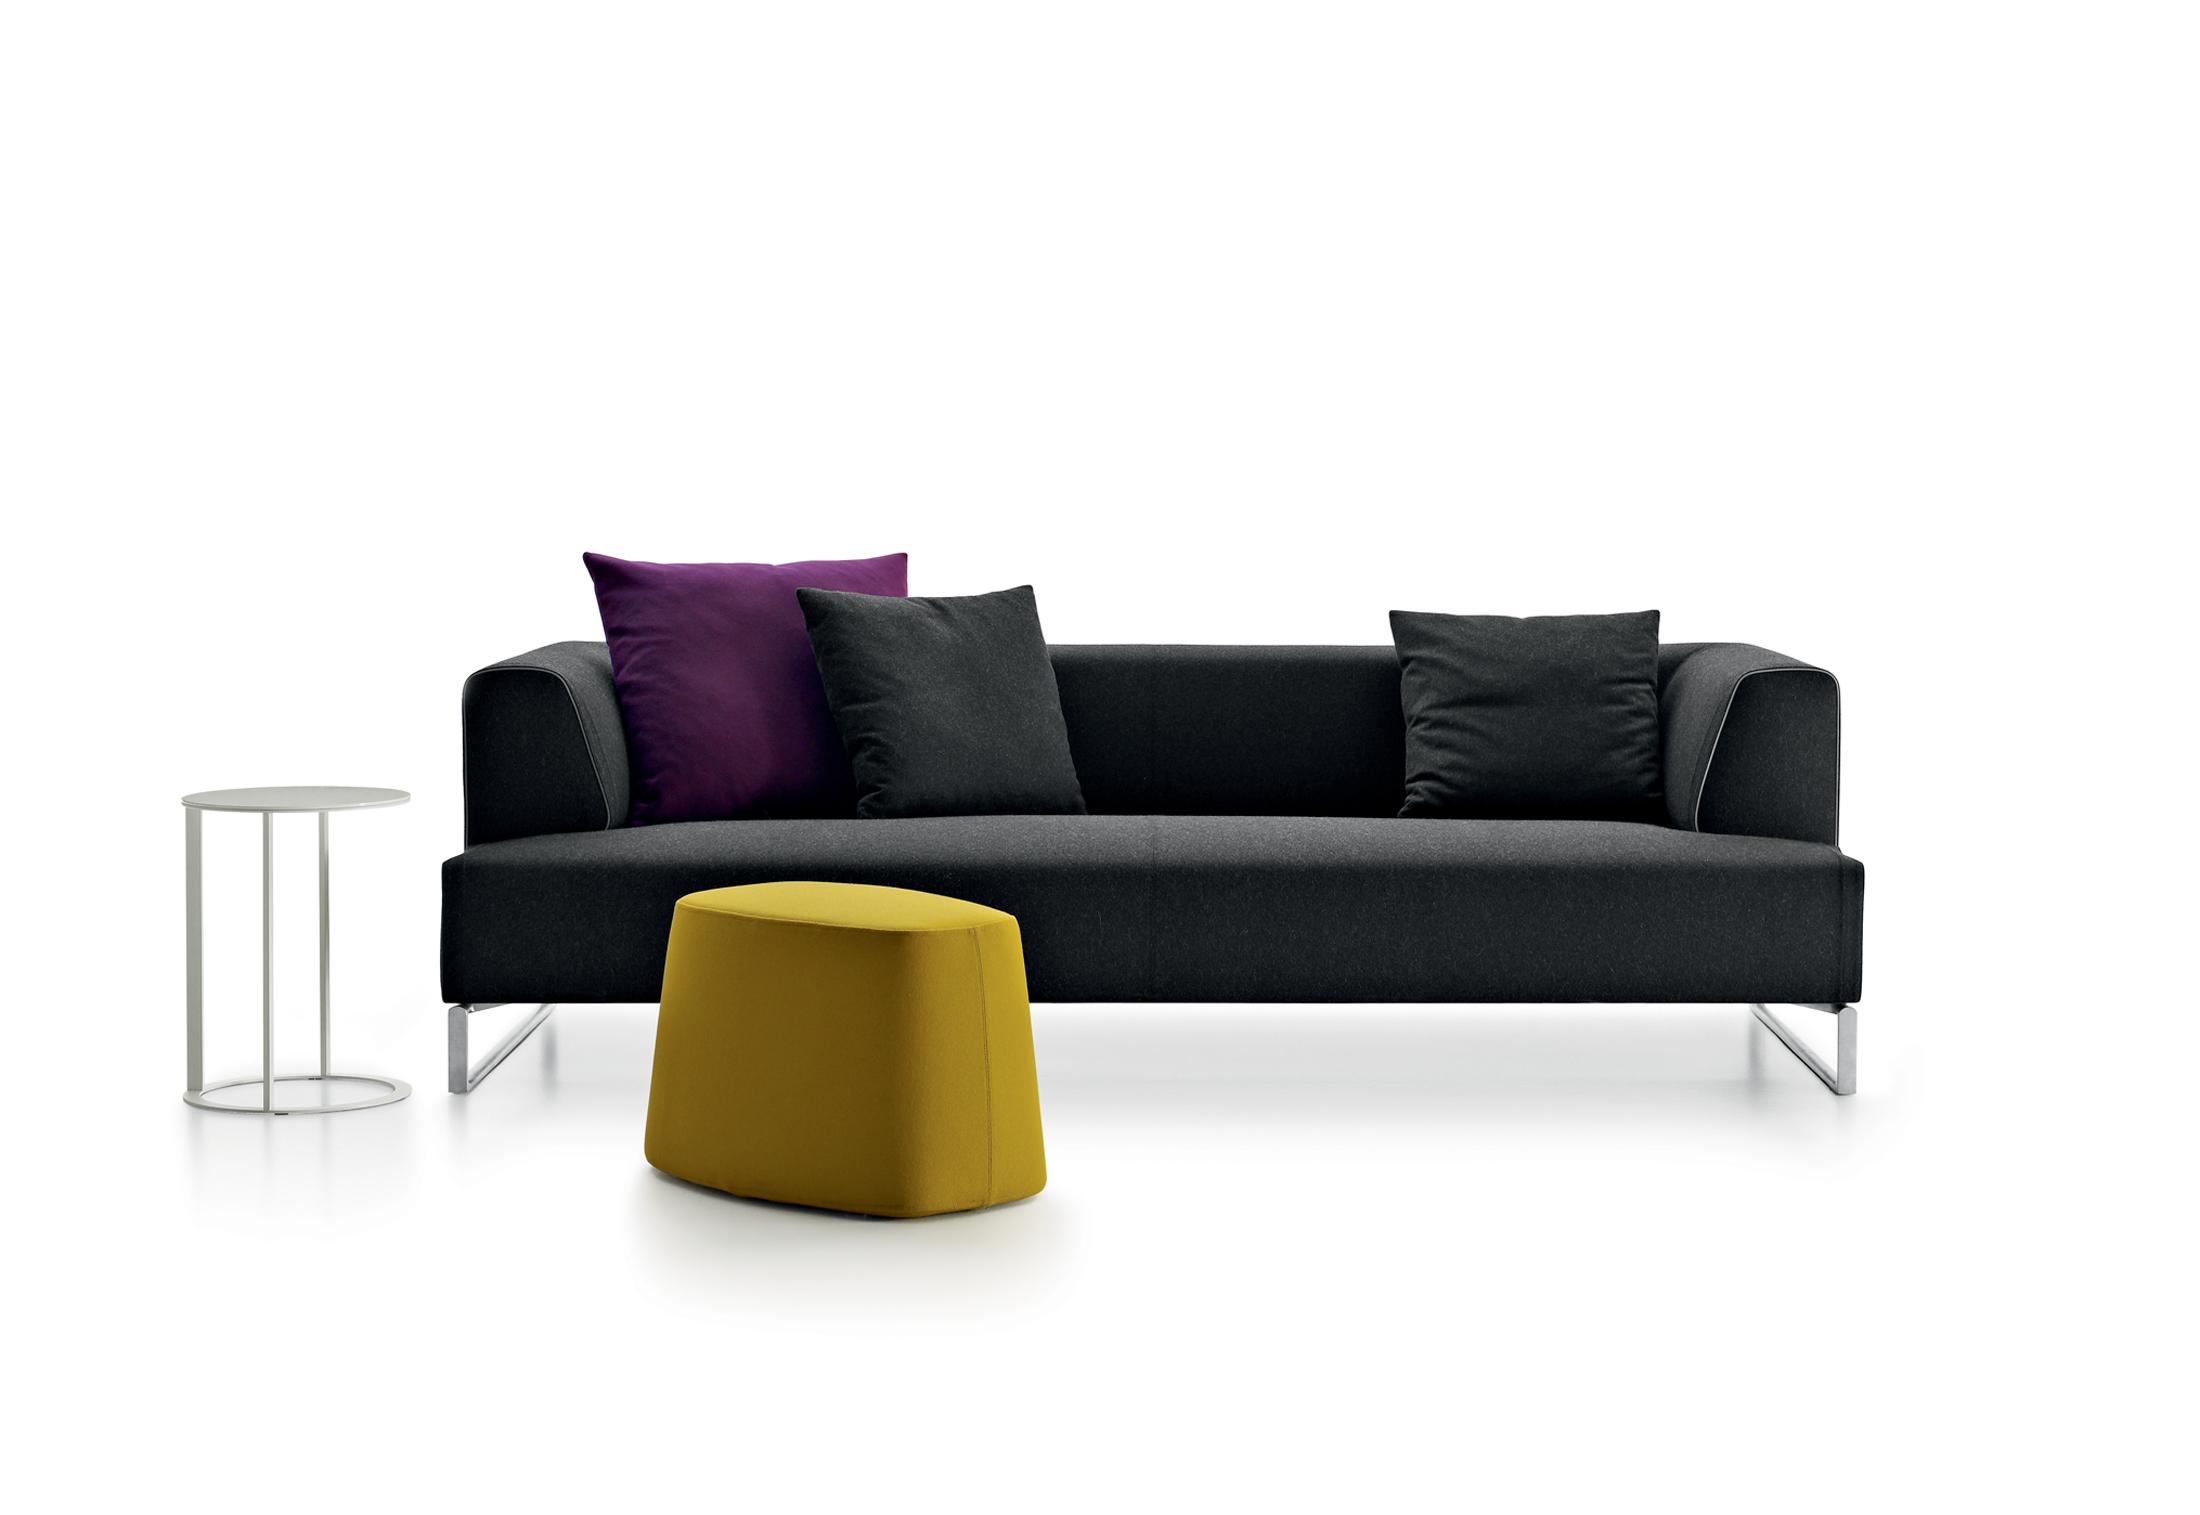 Superb Solo 14 Sofa By Bb Italia Stylepark Ibusinesslaw Wood Chair Design Ideas Ibusinesslaworg